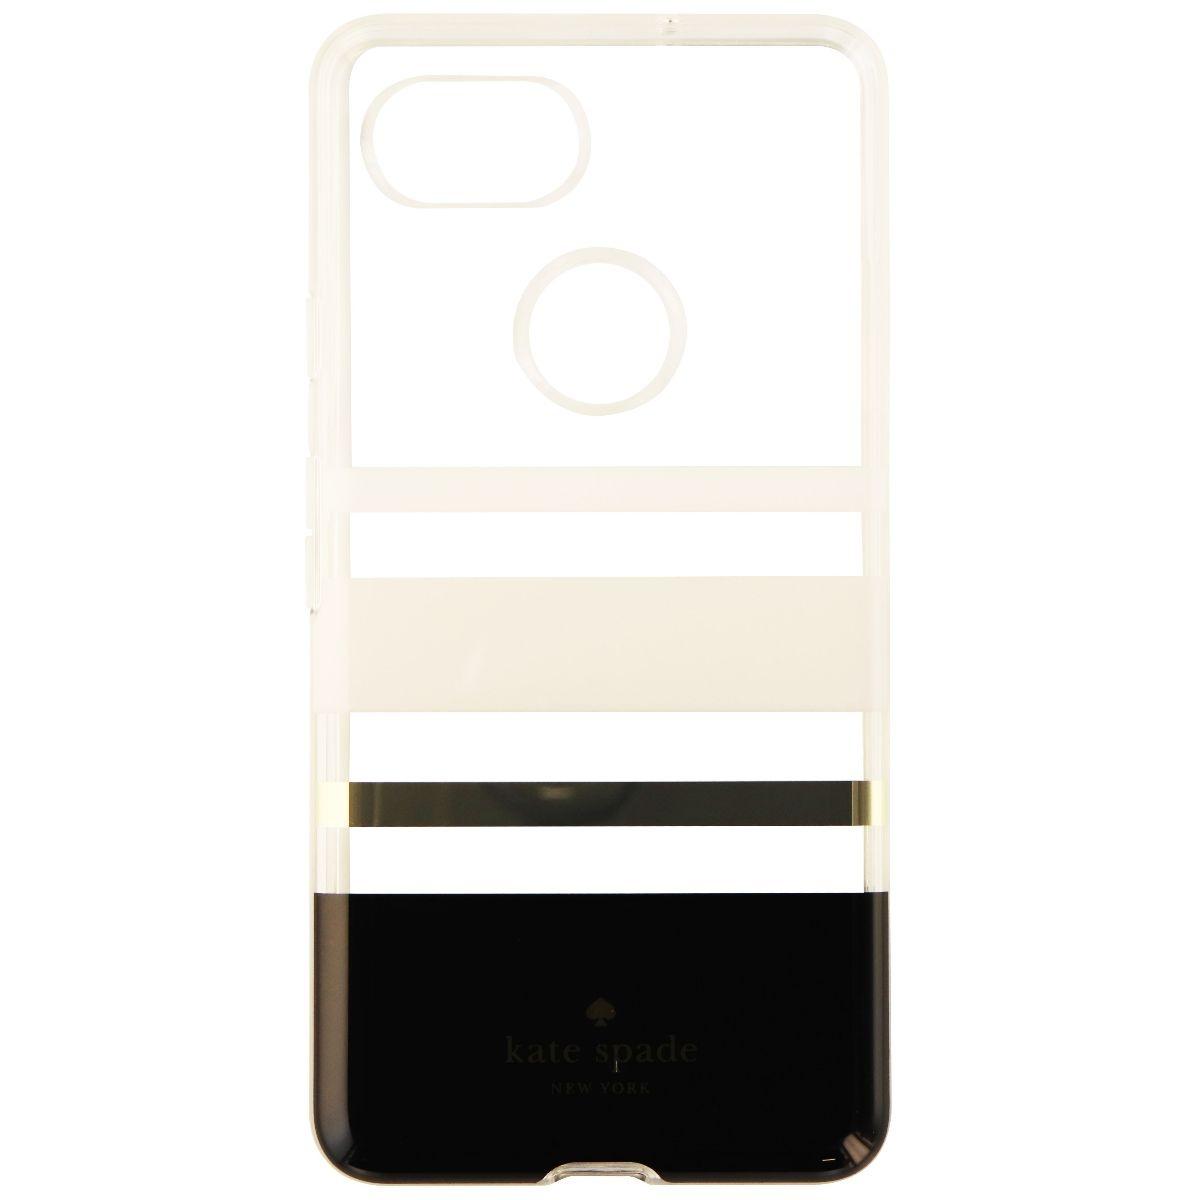 Kate Spade Flexible Hardshell Case Cover For Pixel 2 XL White Clear (Charlotte)